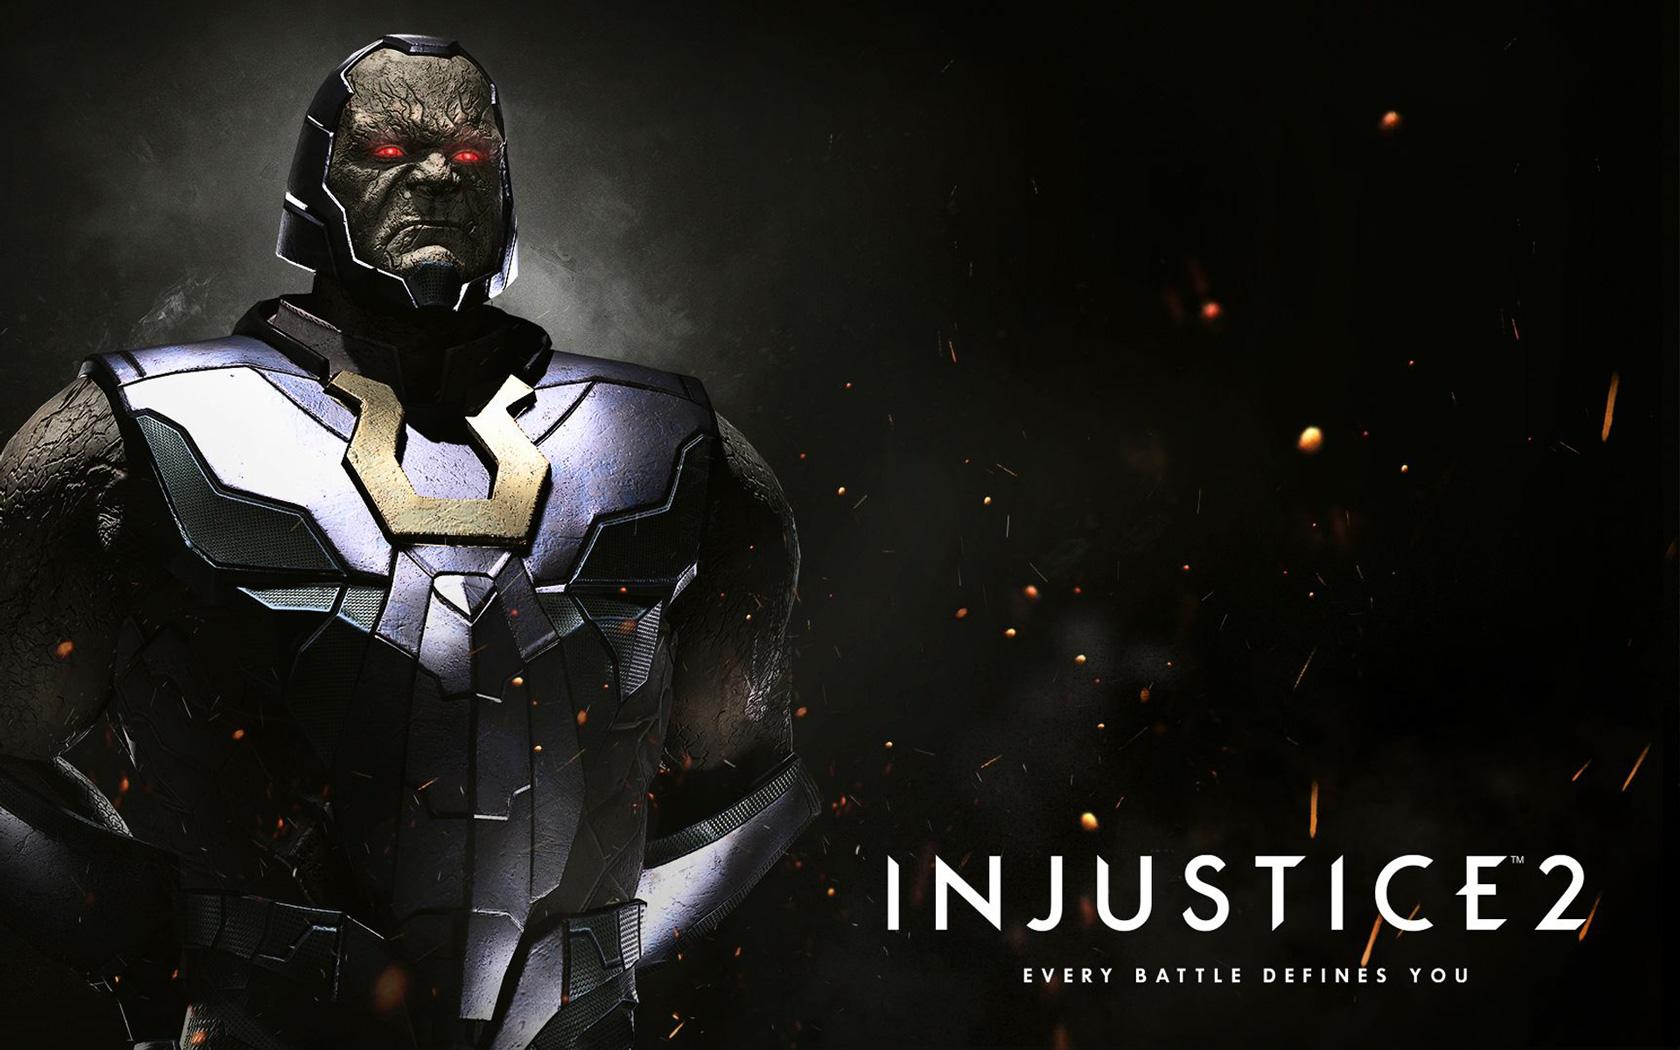 Free Injustice 2 Wallpaper in 1680x1050